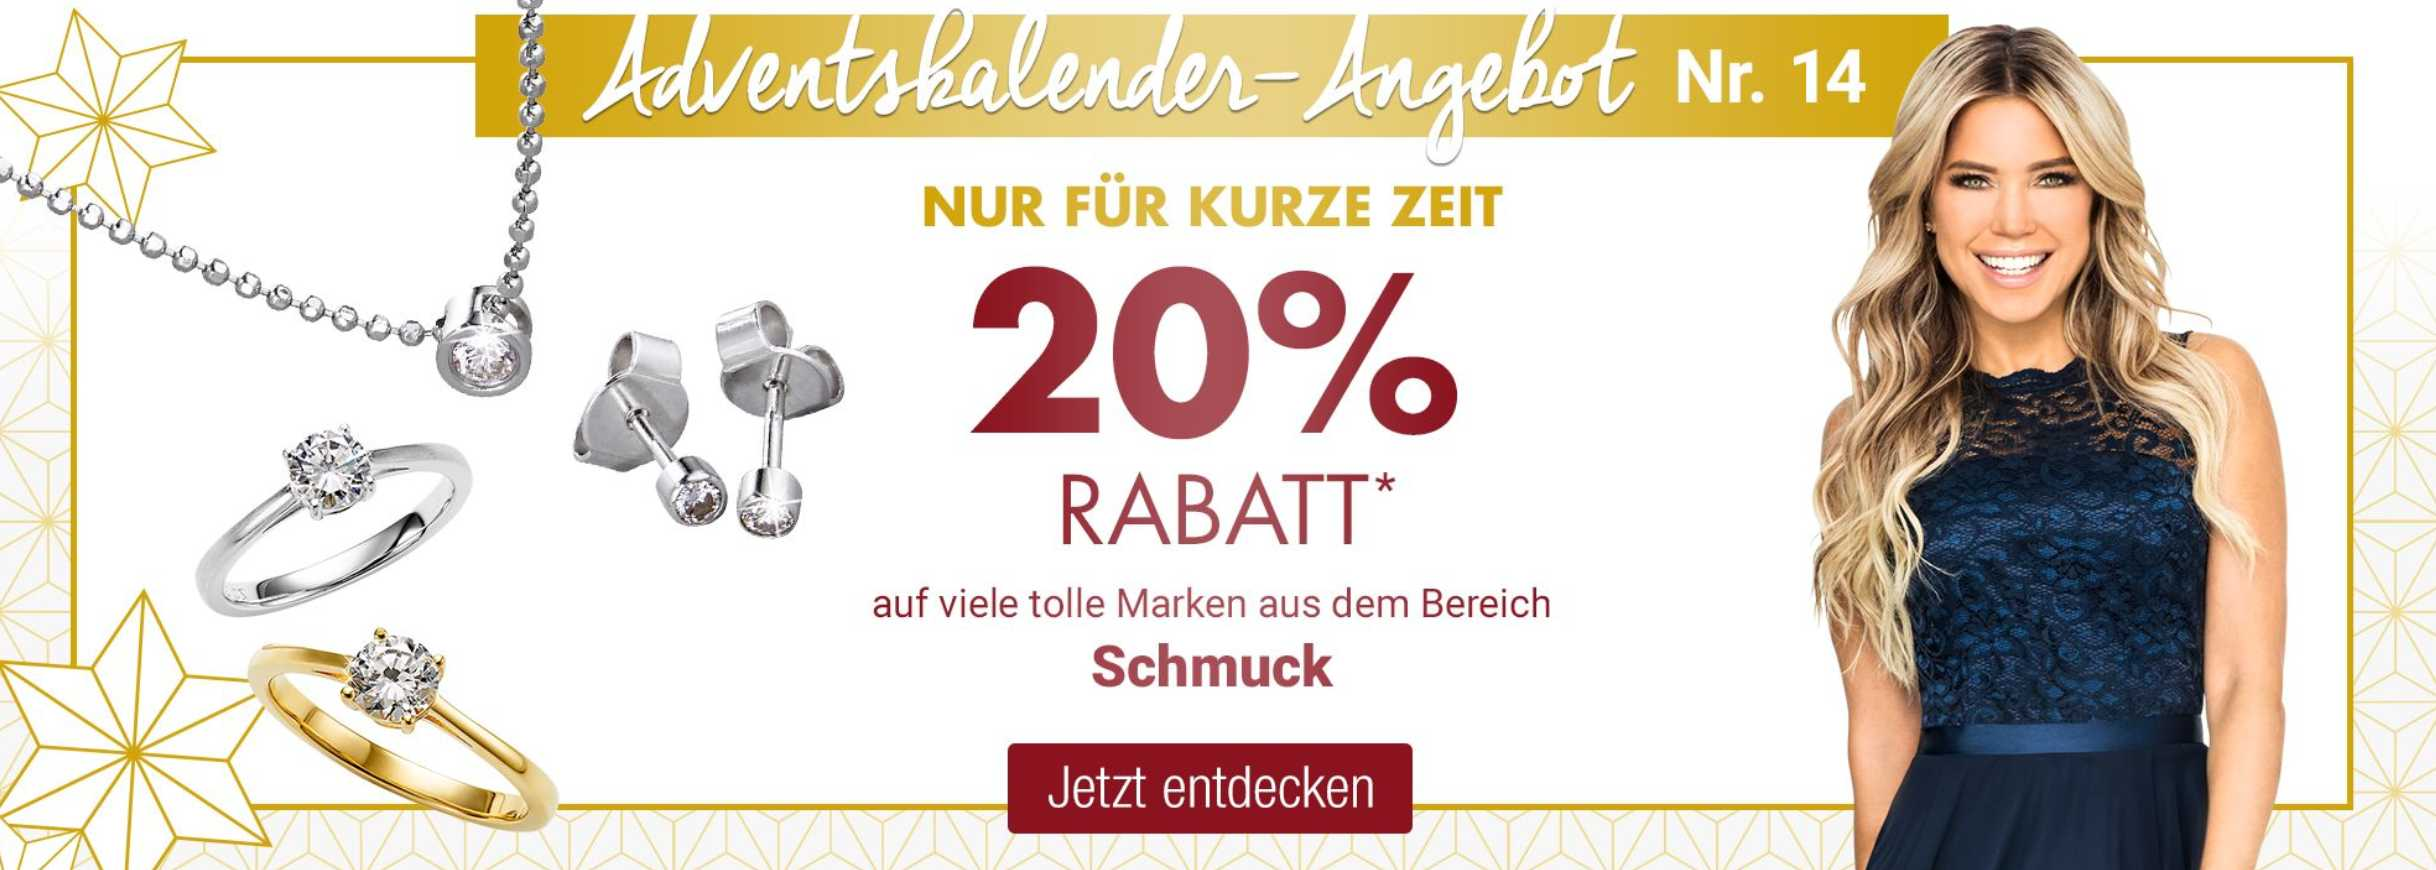 Galeria Kaufhof: 20% Rabatt auf Schmuck